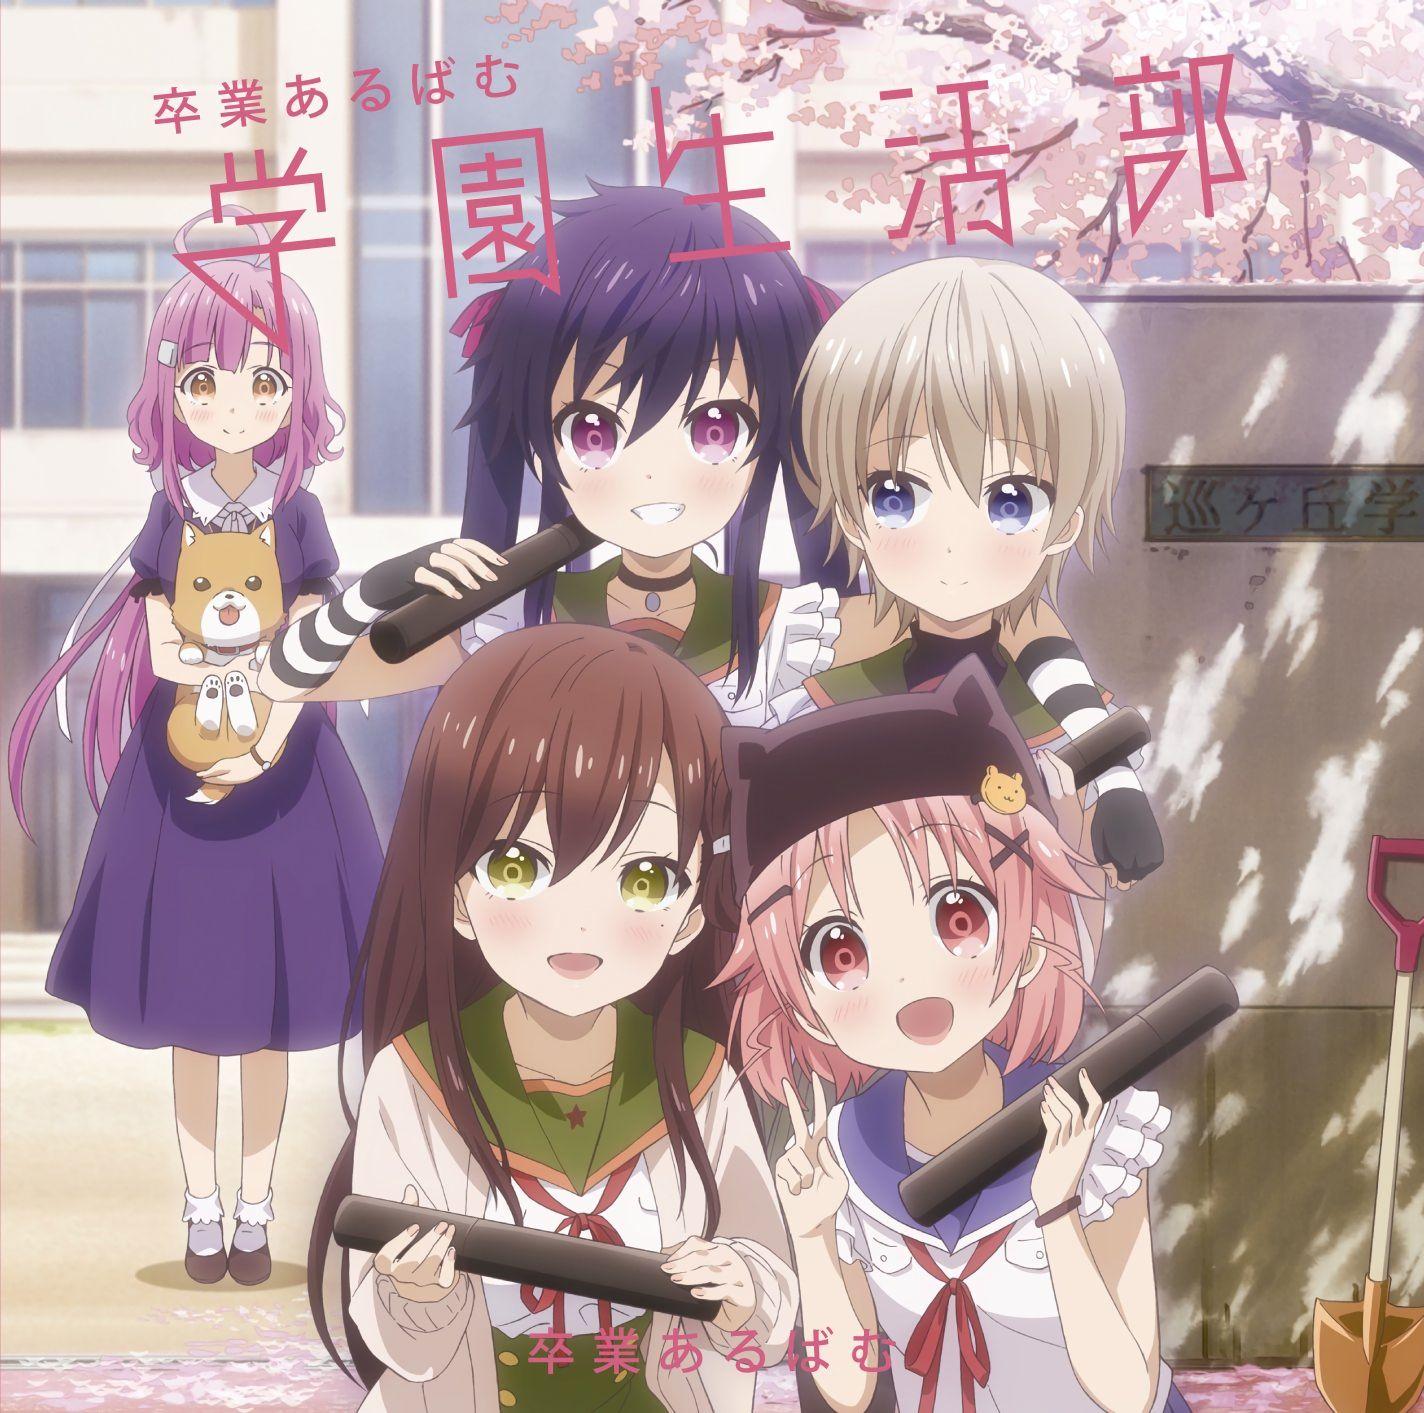 Ebisuzawa Kurumi Naoki Miki Sakura Megumi Takeya Yuki Taromaru Wakasa Yuuri Anime Kawaii Anime Anime Stars